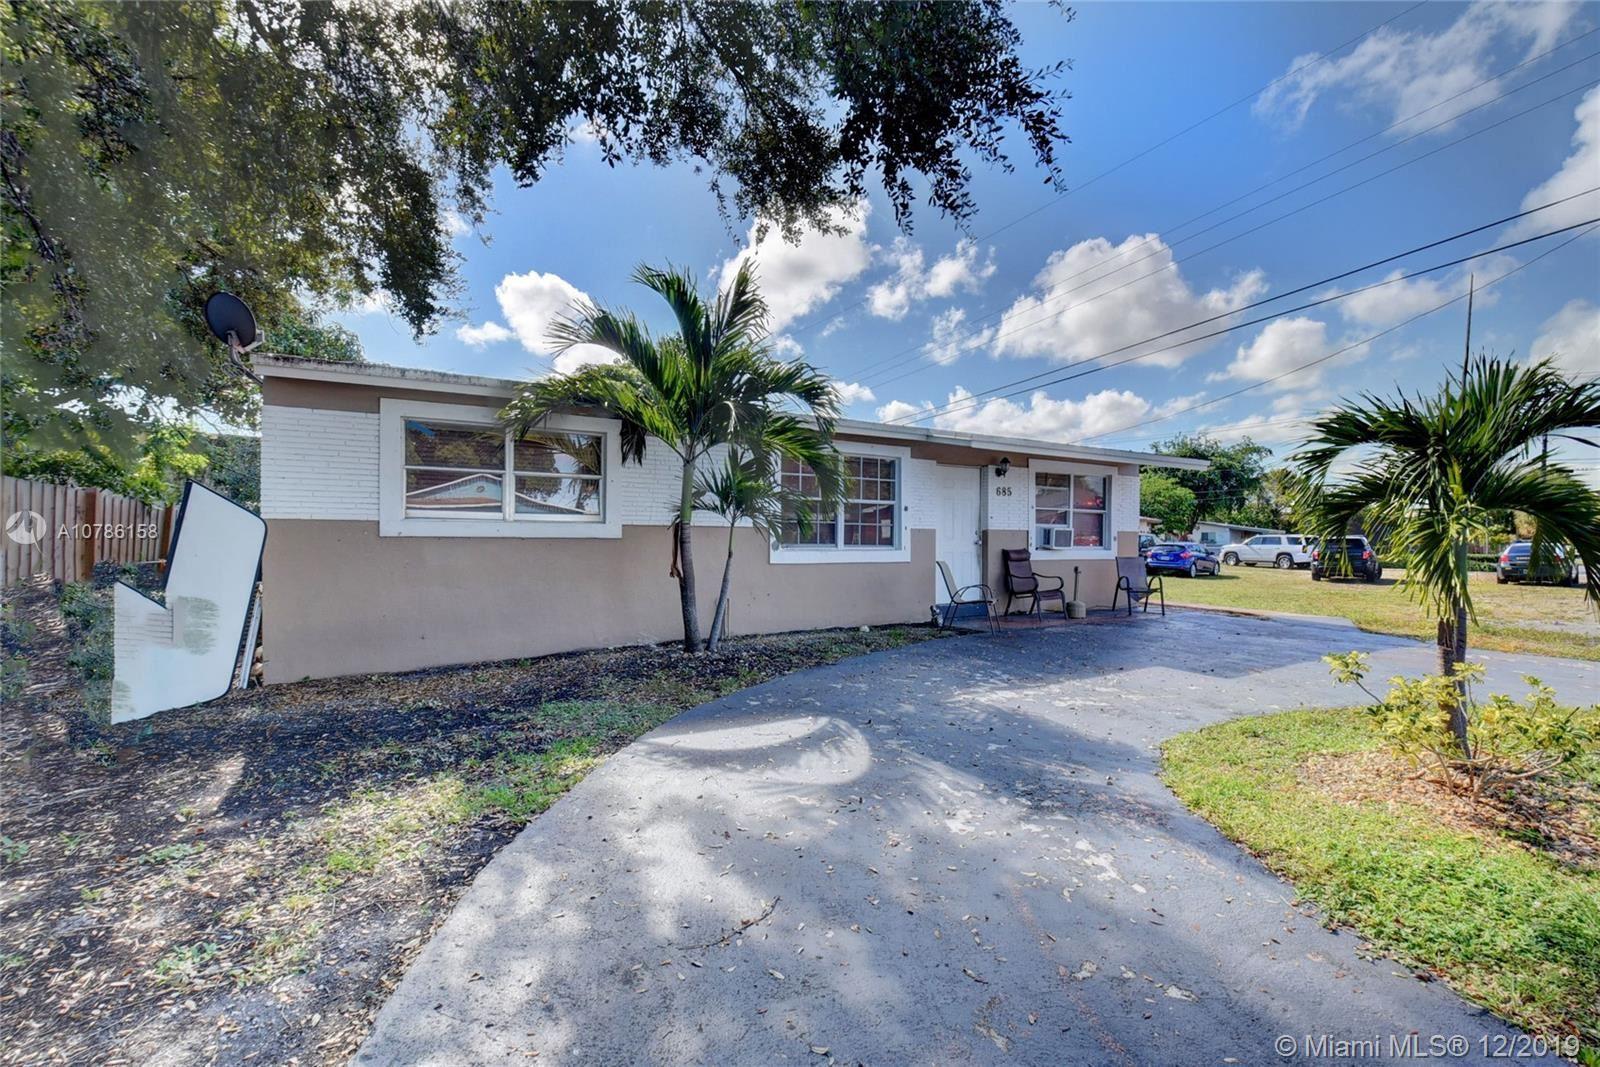 685 SW 7th Ter, Dania, FL 33004 - MLS#: A10786158